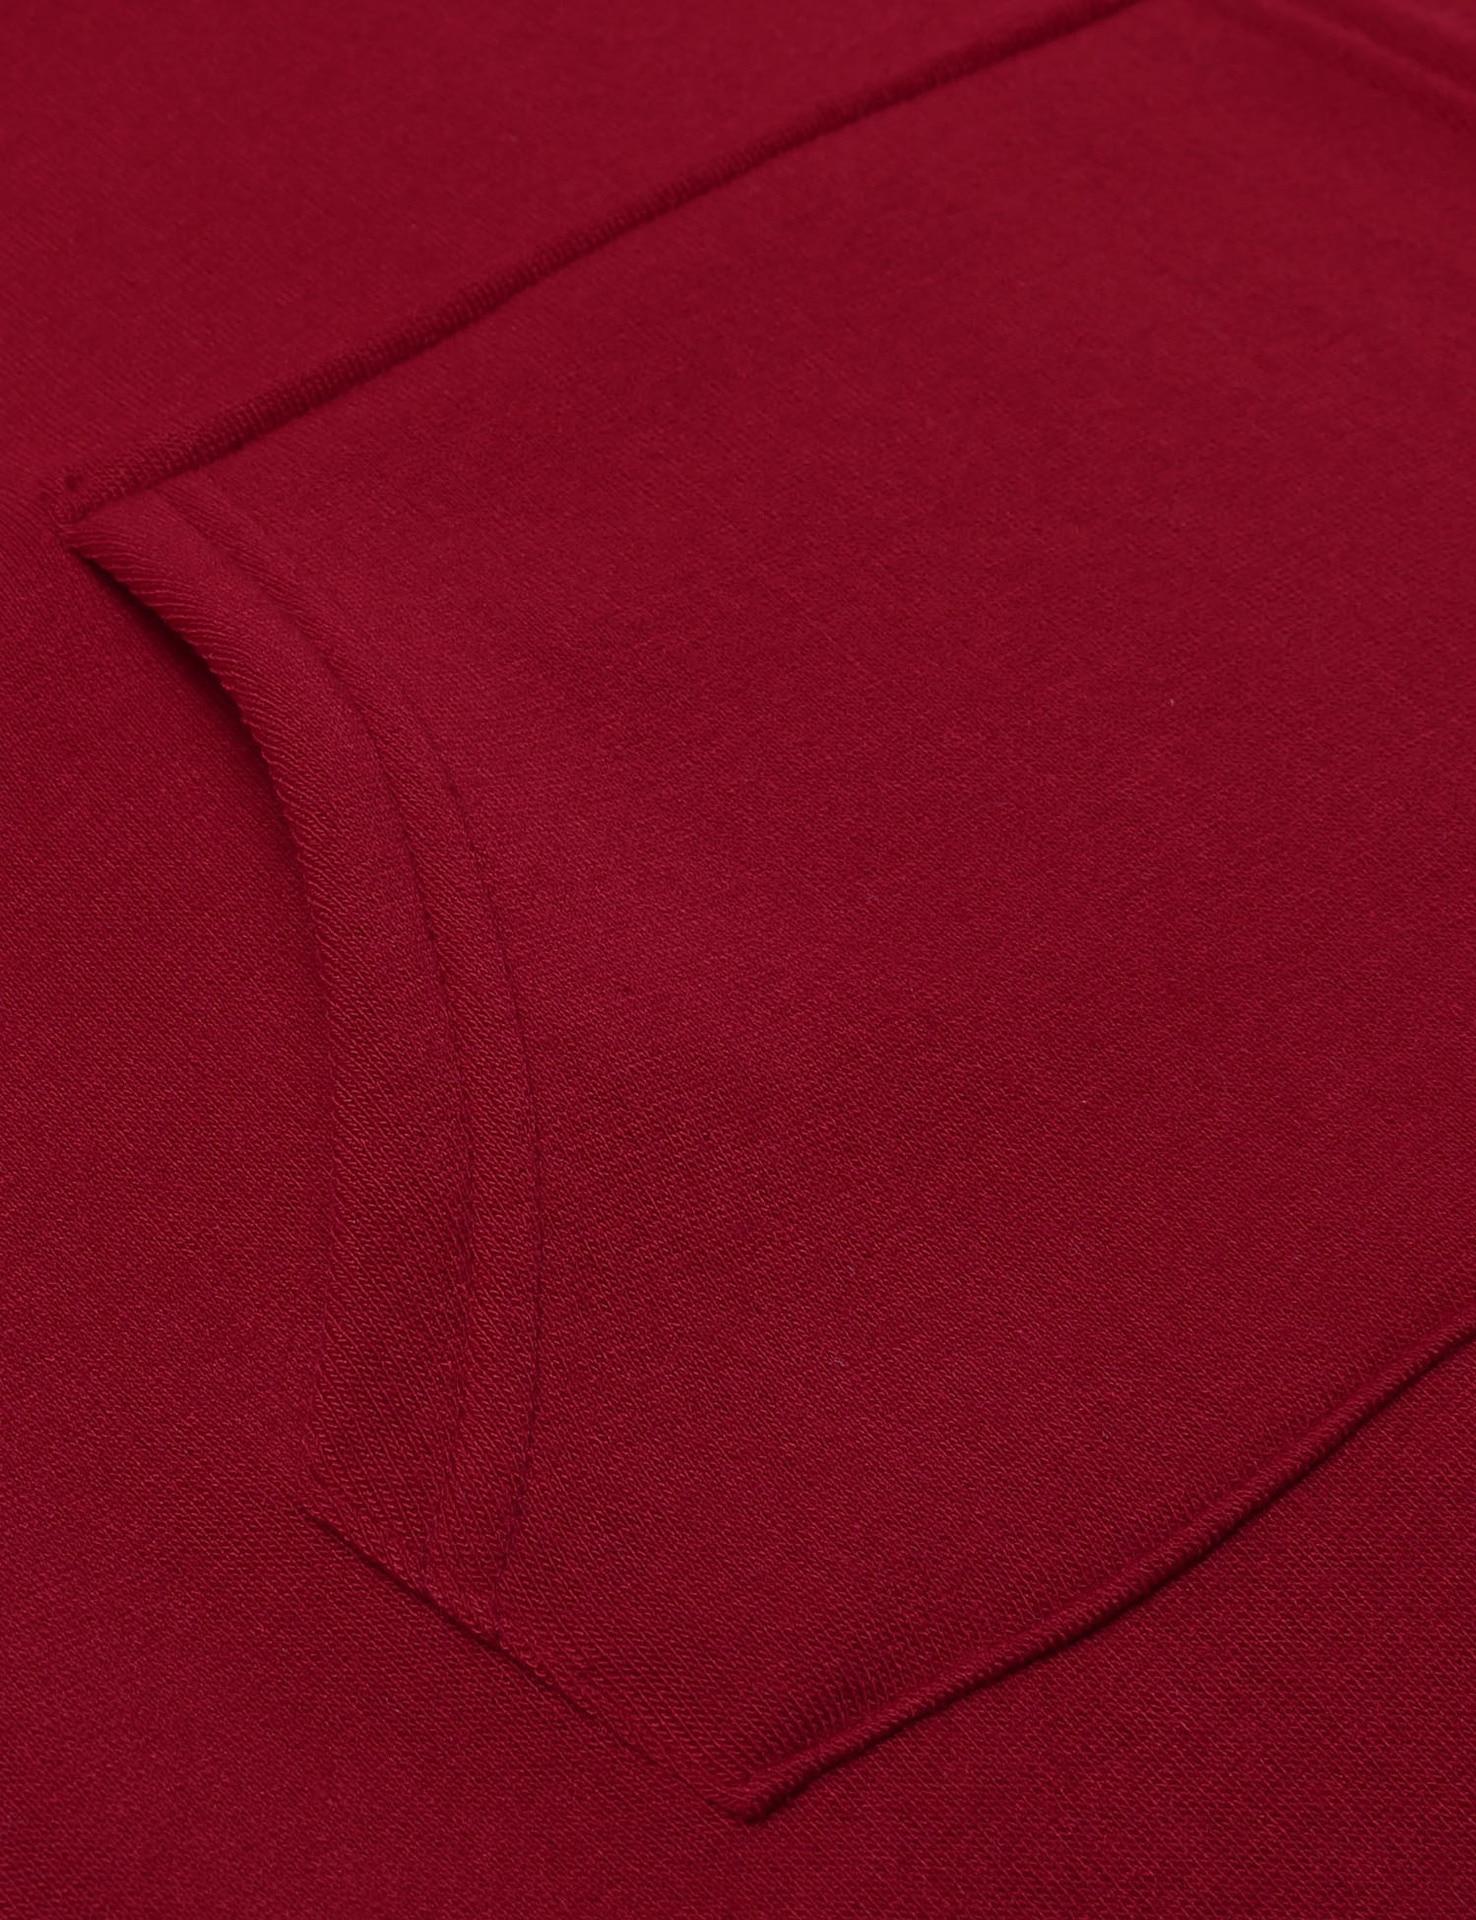 Autumn Winter Women Hoodies Long Sweatshirts Patchwork Fashion FemalePullovers Hoodie Tops Causal Plus Size Feminino Coats | JOMOBabe | jomobabe.com